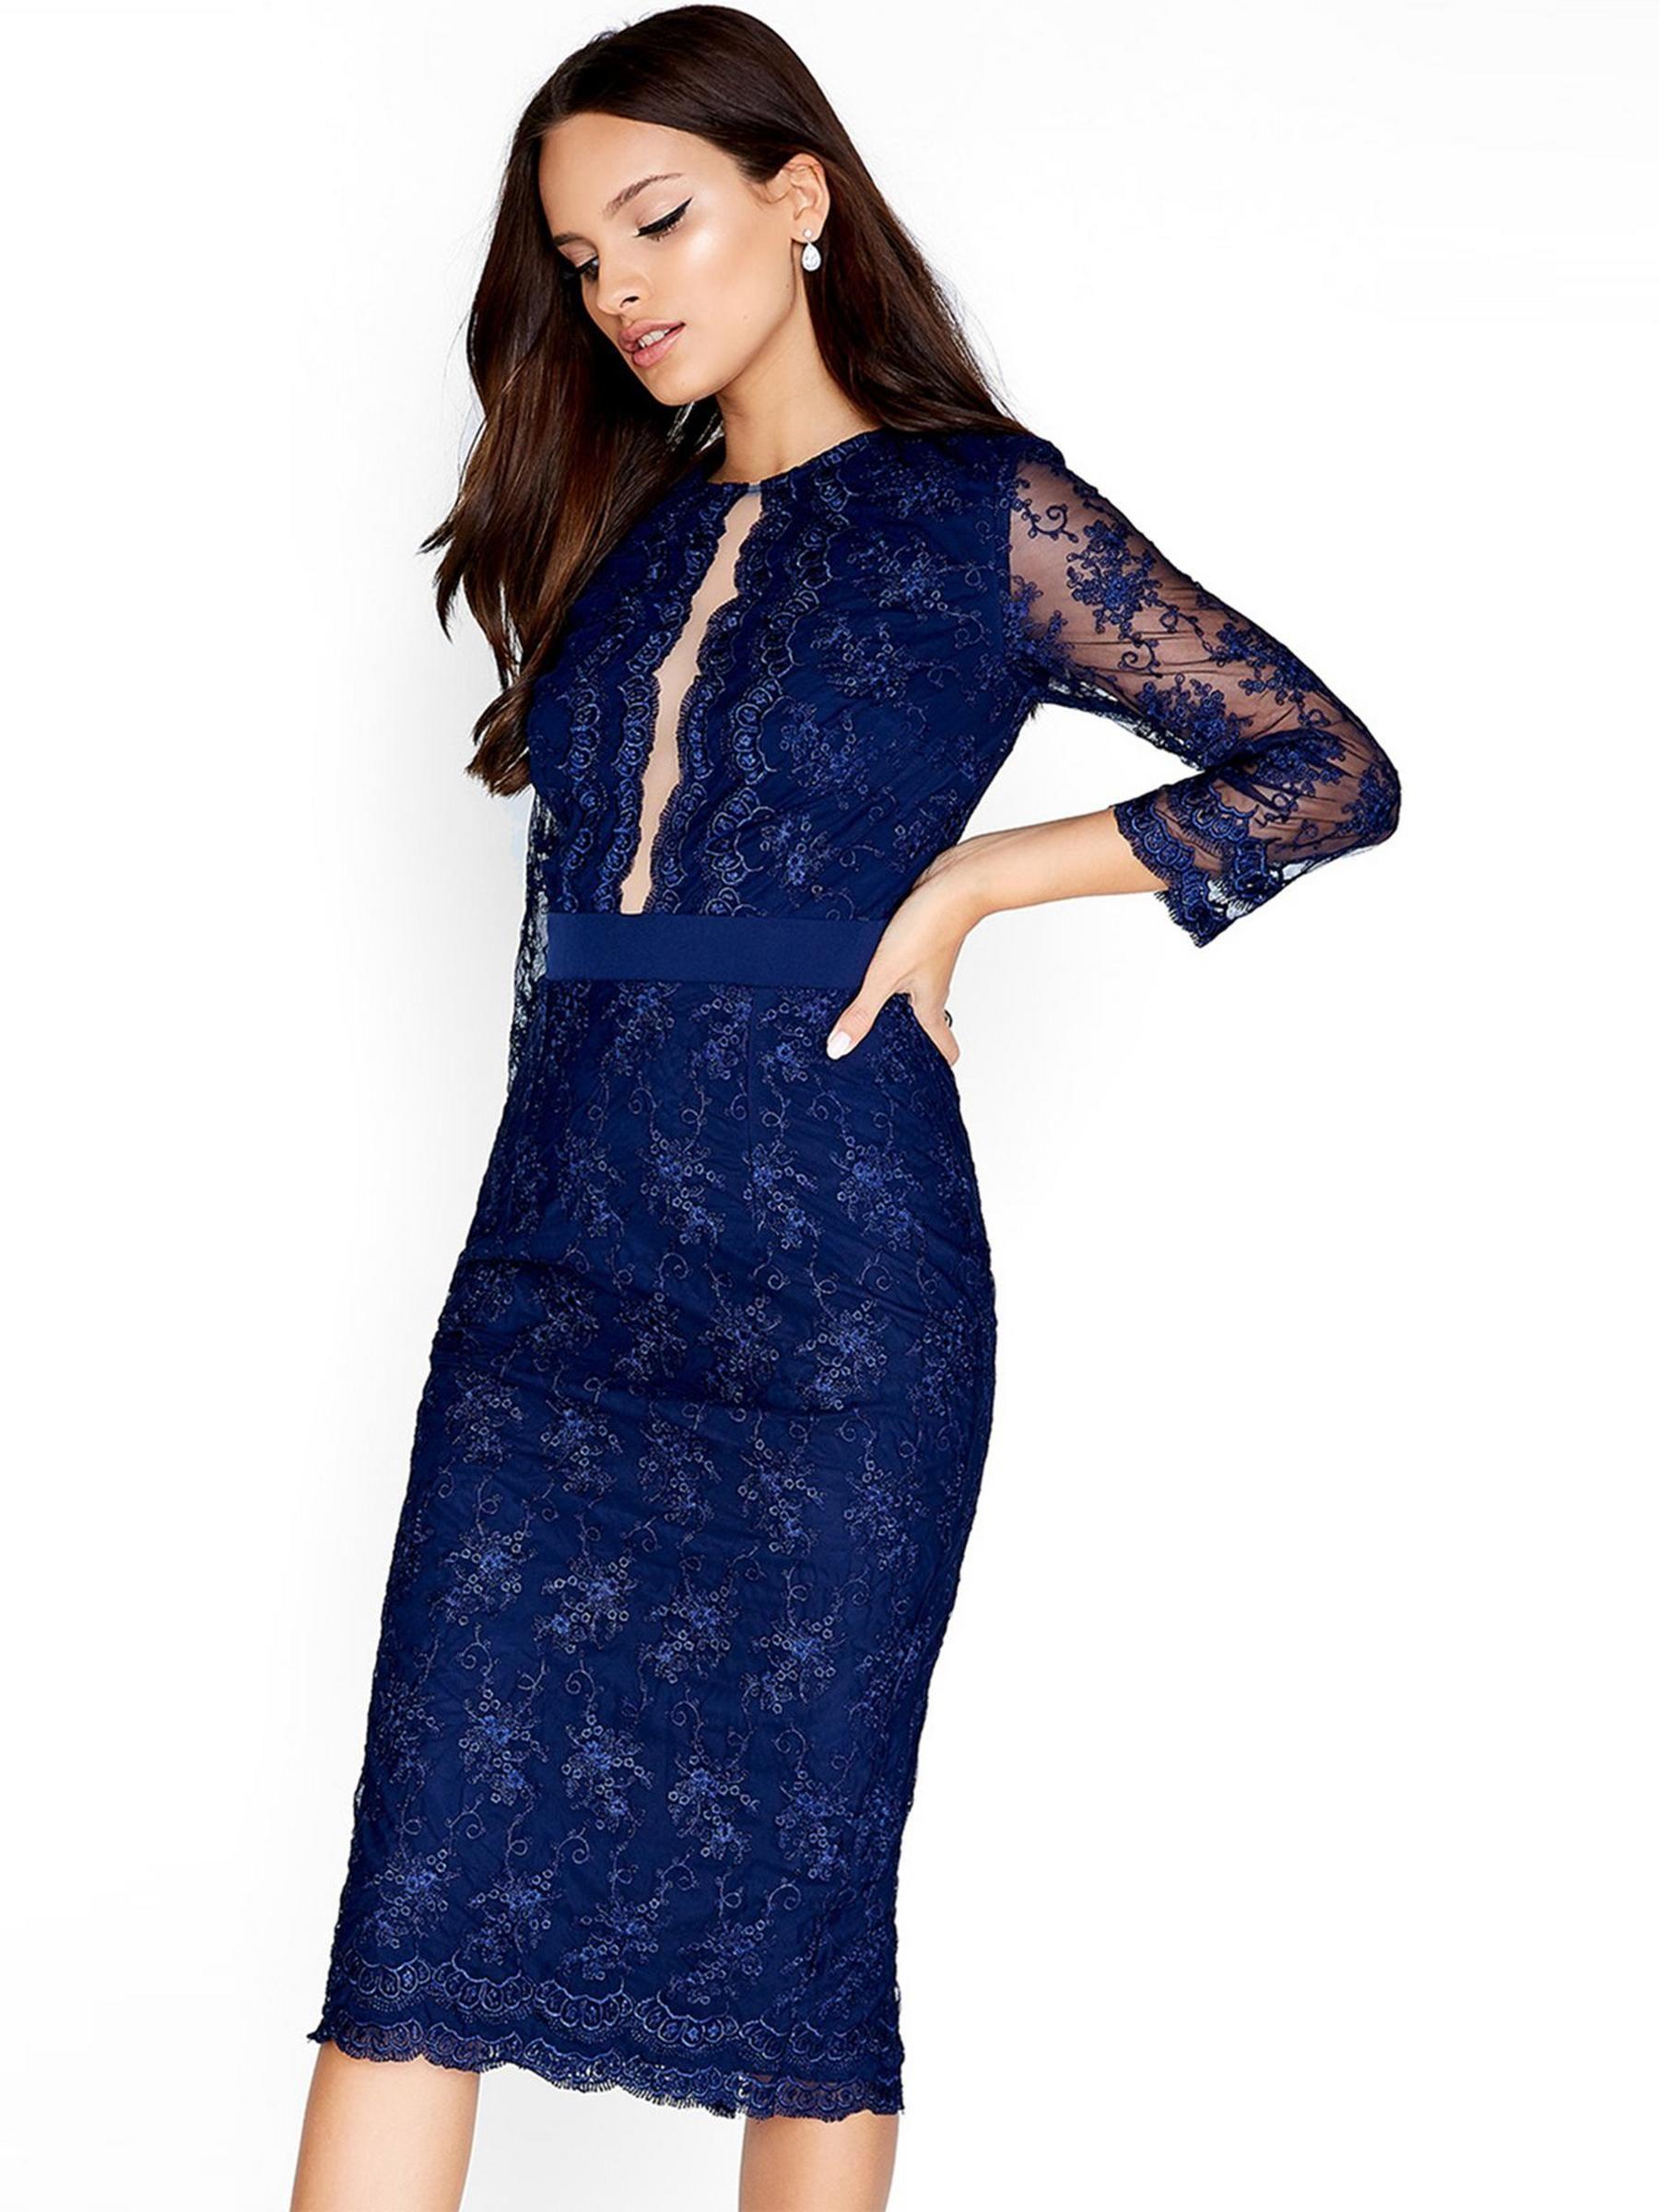 6363e4a1f393 Navy Midi Dress With Sleeves Uk – DACC